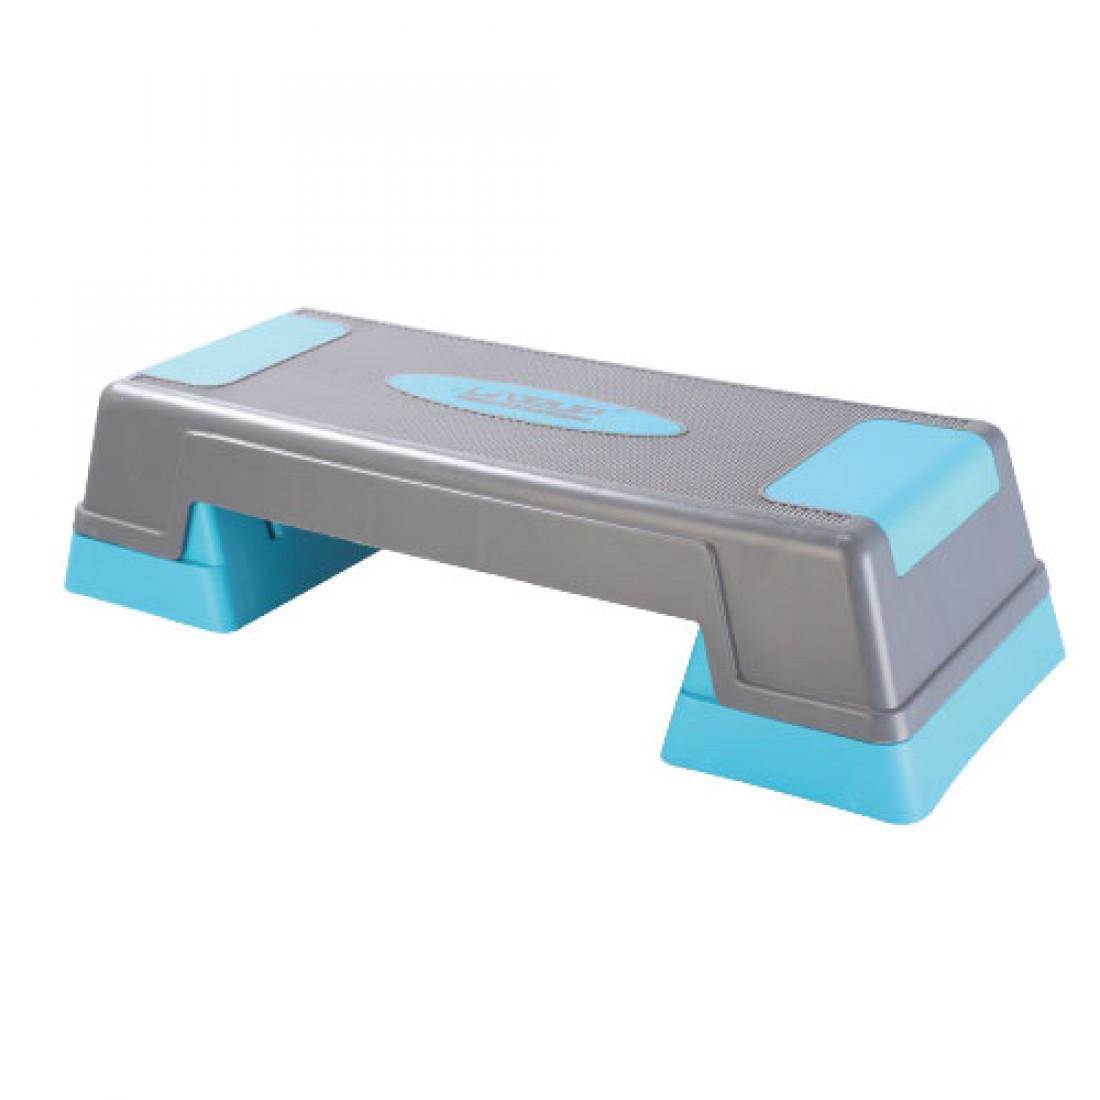 Степ-платформа регулируемая LiveUp Power Step